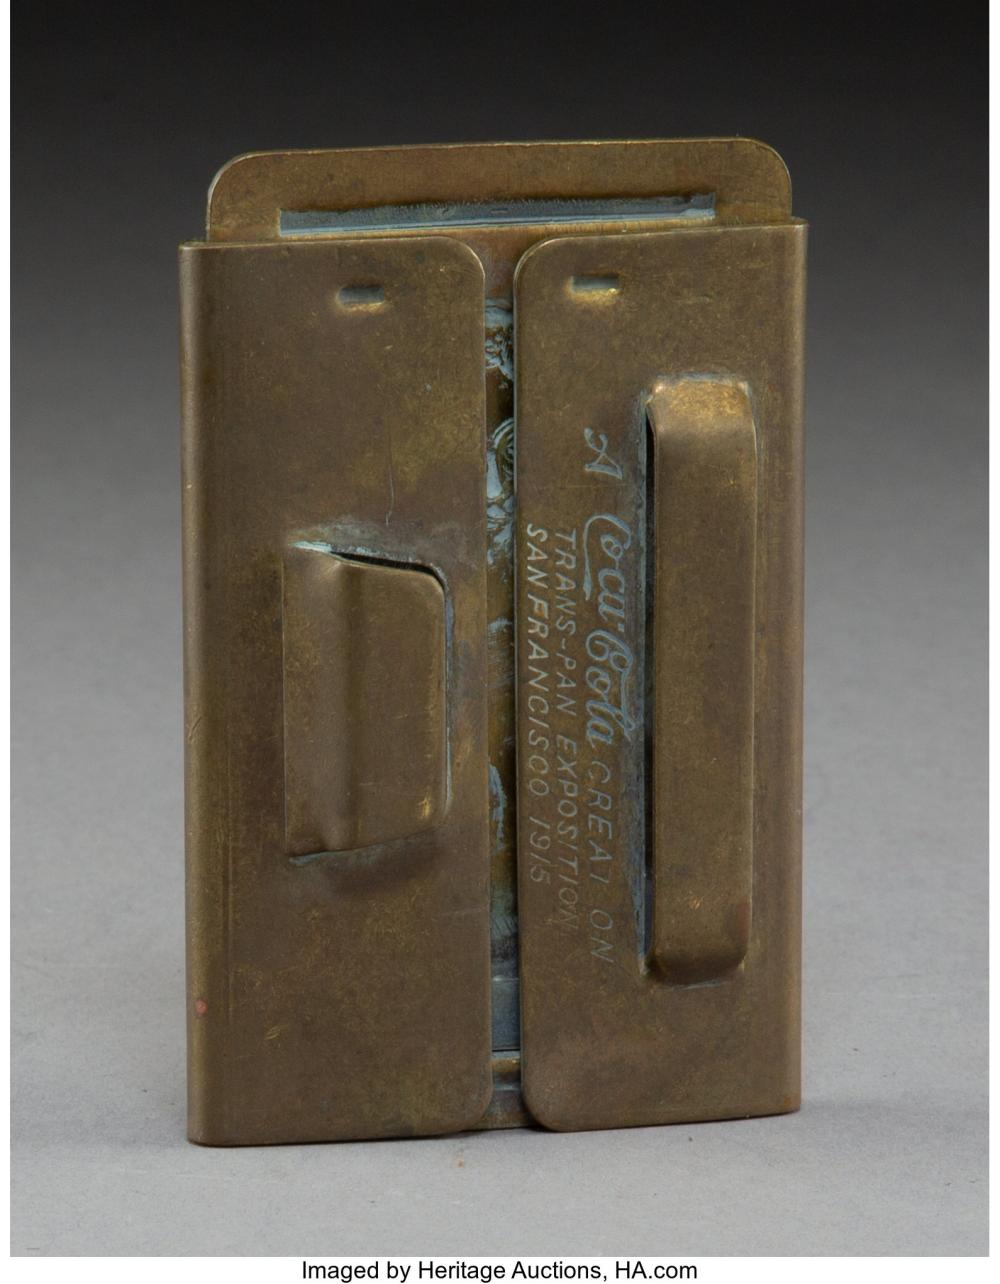 Lot 21191: A Coca Cola Brass Erotic Belt Buckle, 1915 Marks: A Coca Cola CREATION, TRANS-PA